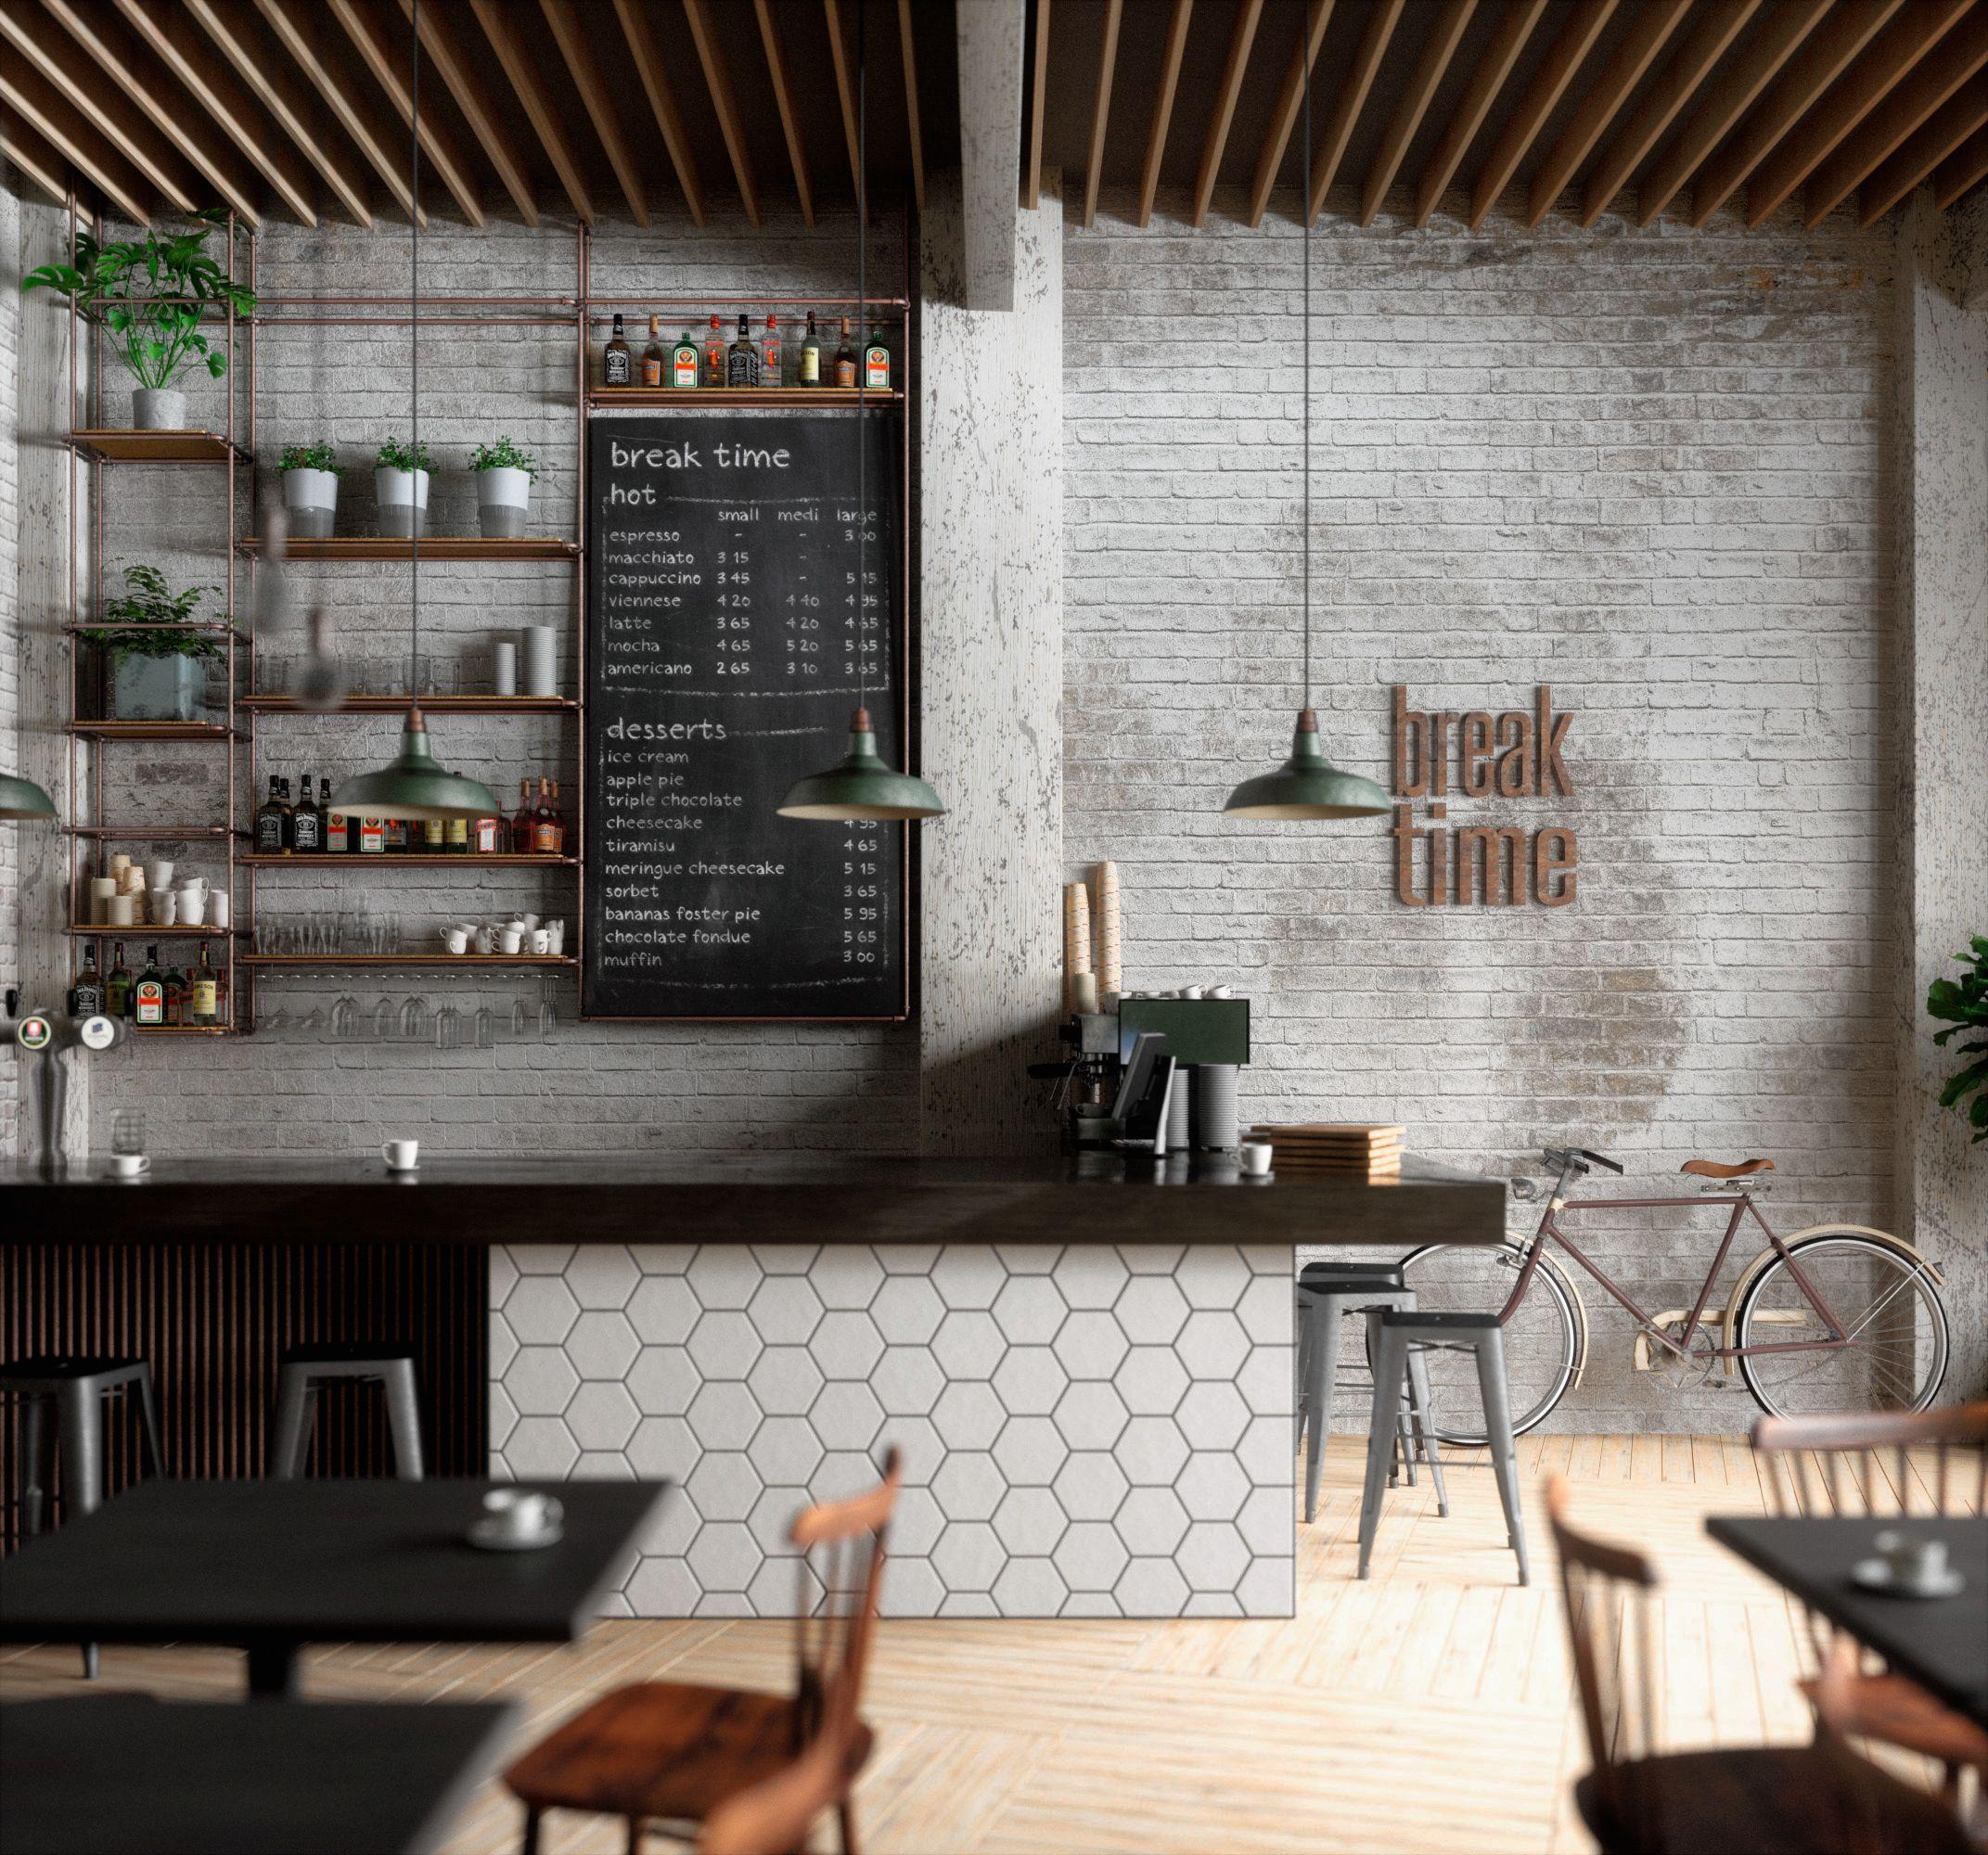 Design For A Coffee Shop In London Cafenea Interioare Interior